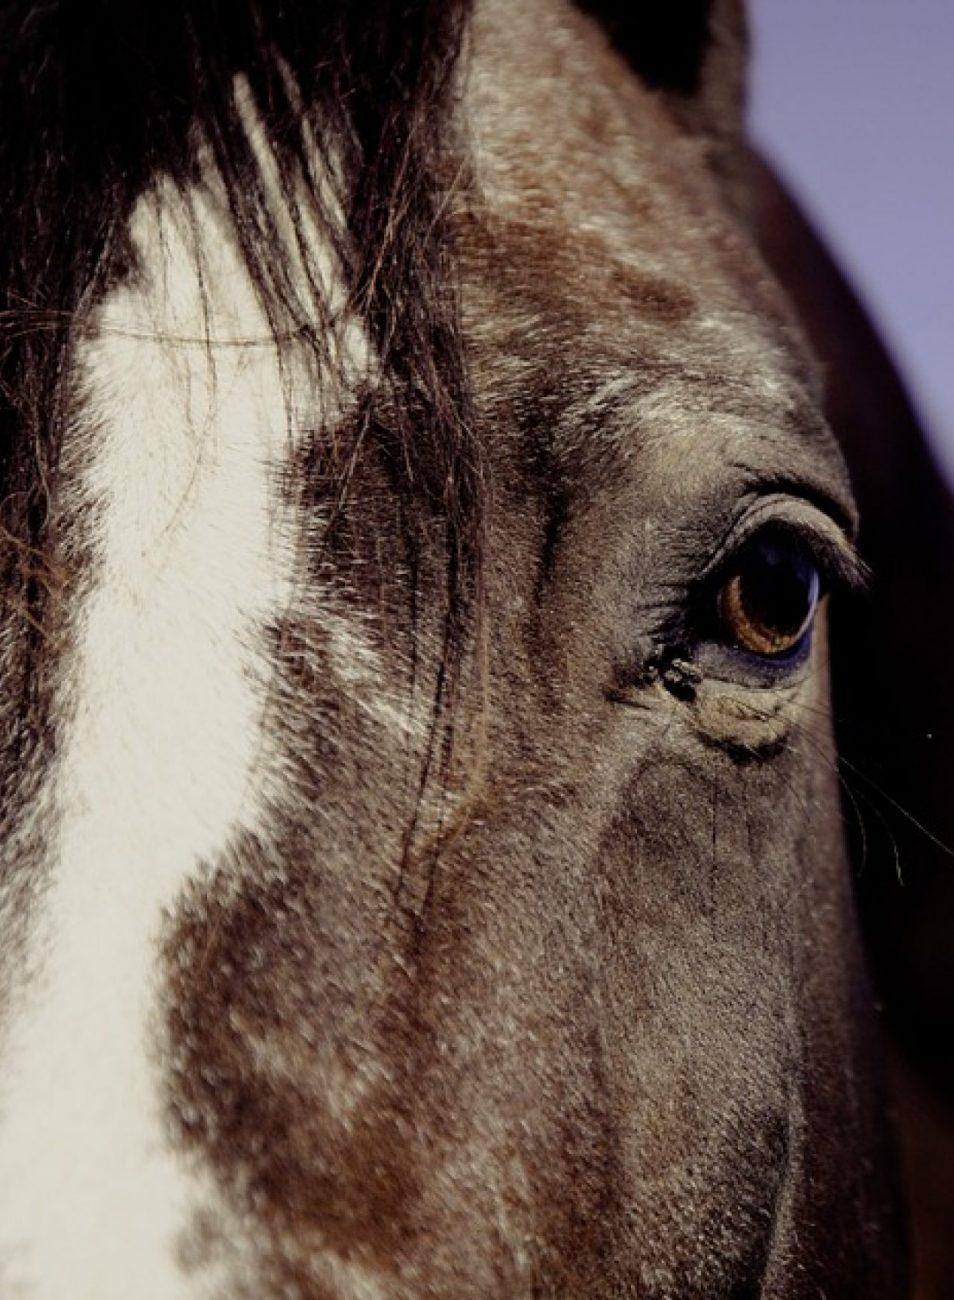 cropped-cropped-horse-594191_960_720-OJO.jpg